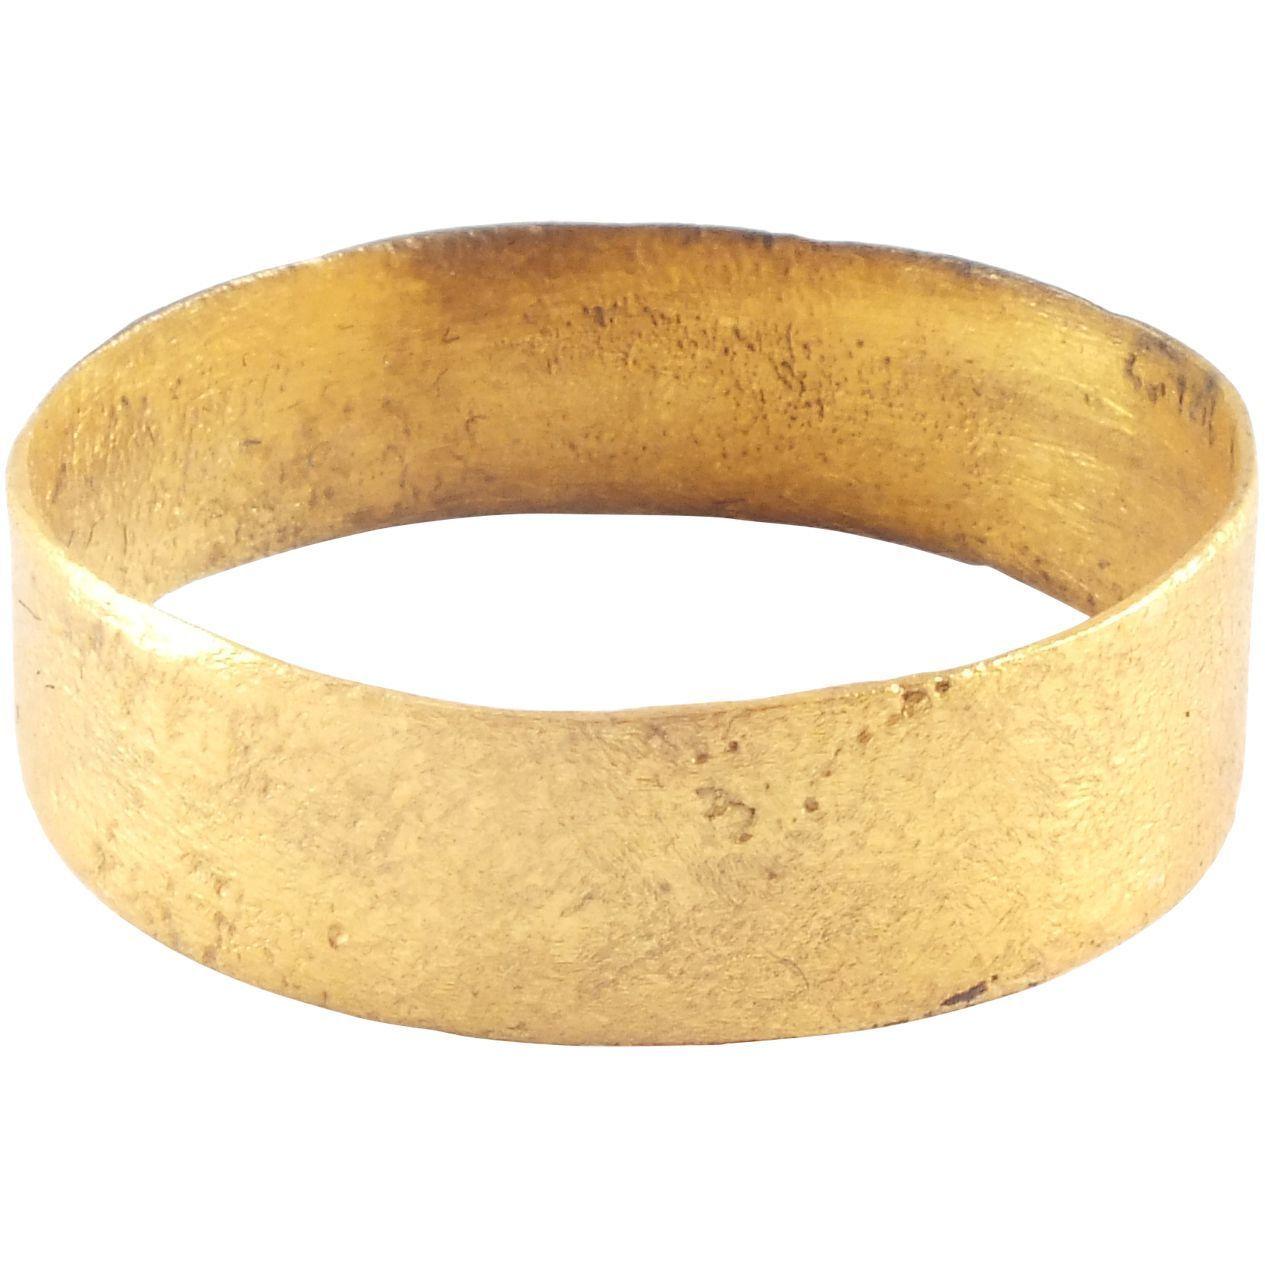 VIKING MAN'S WEDDING RING 8501050 AD Viking men